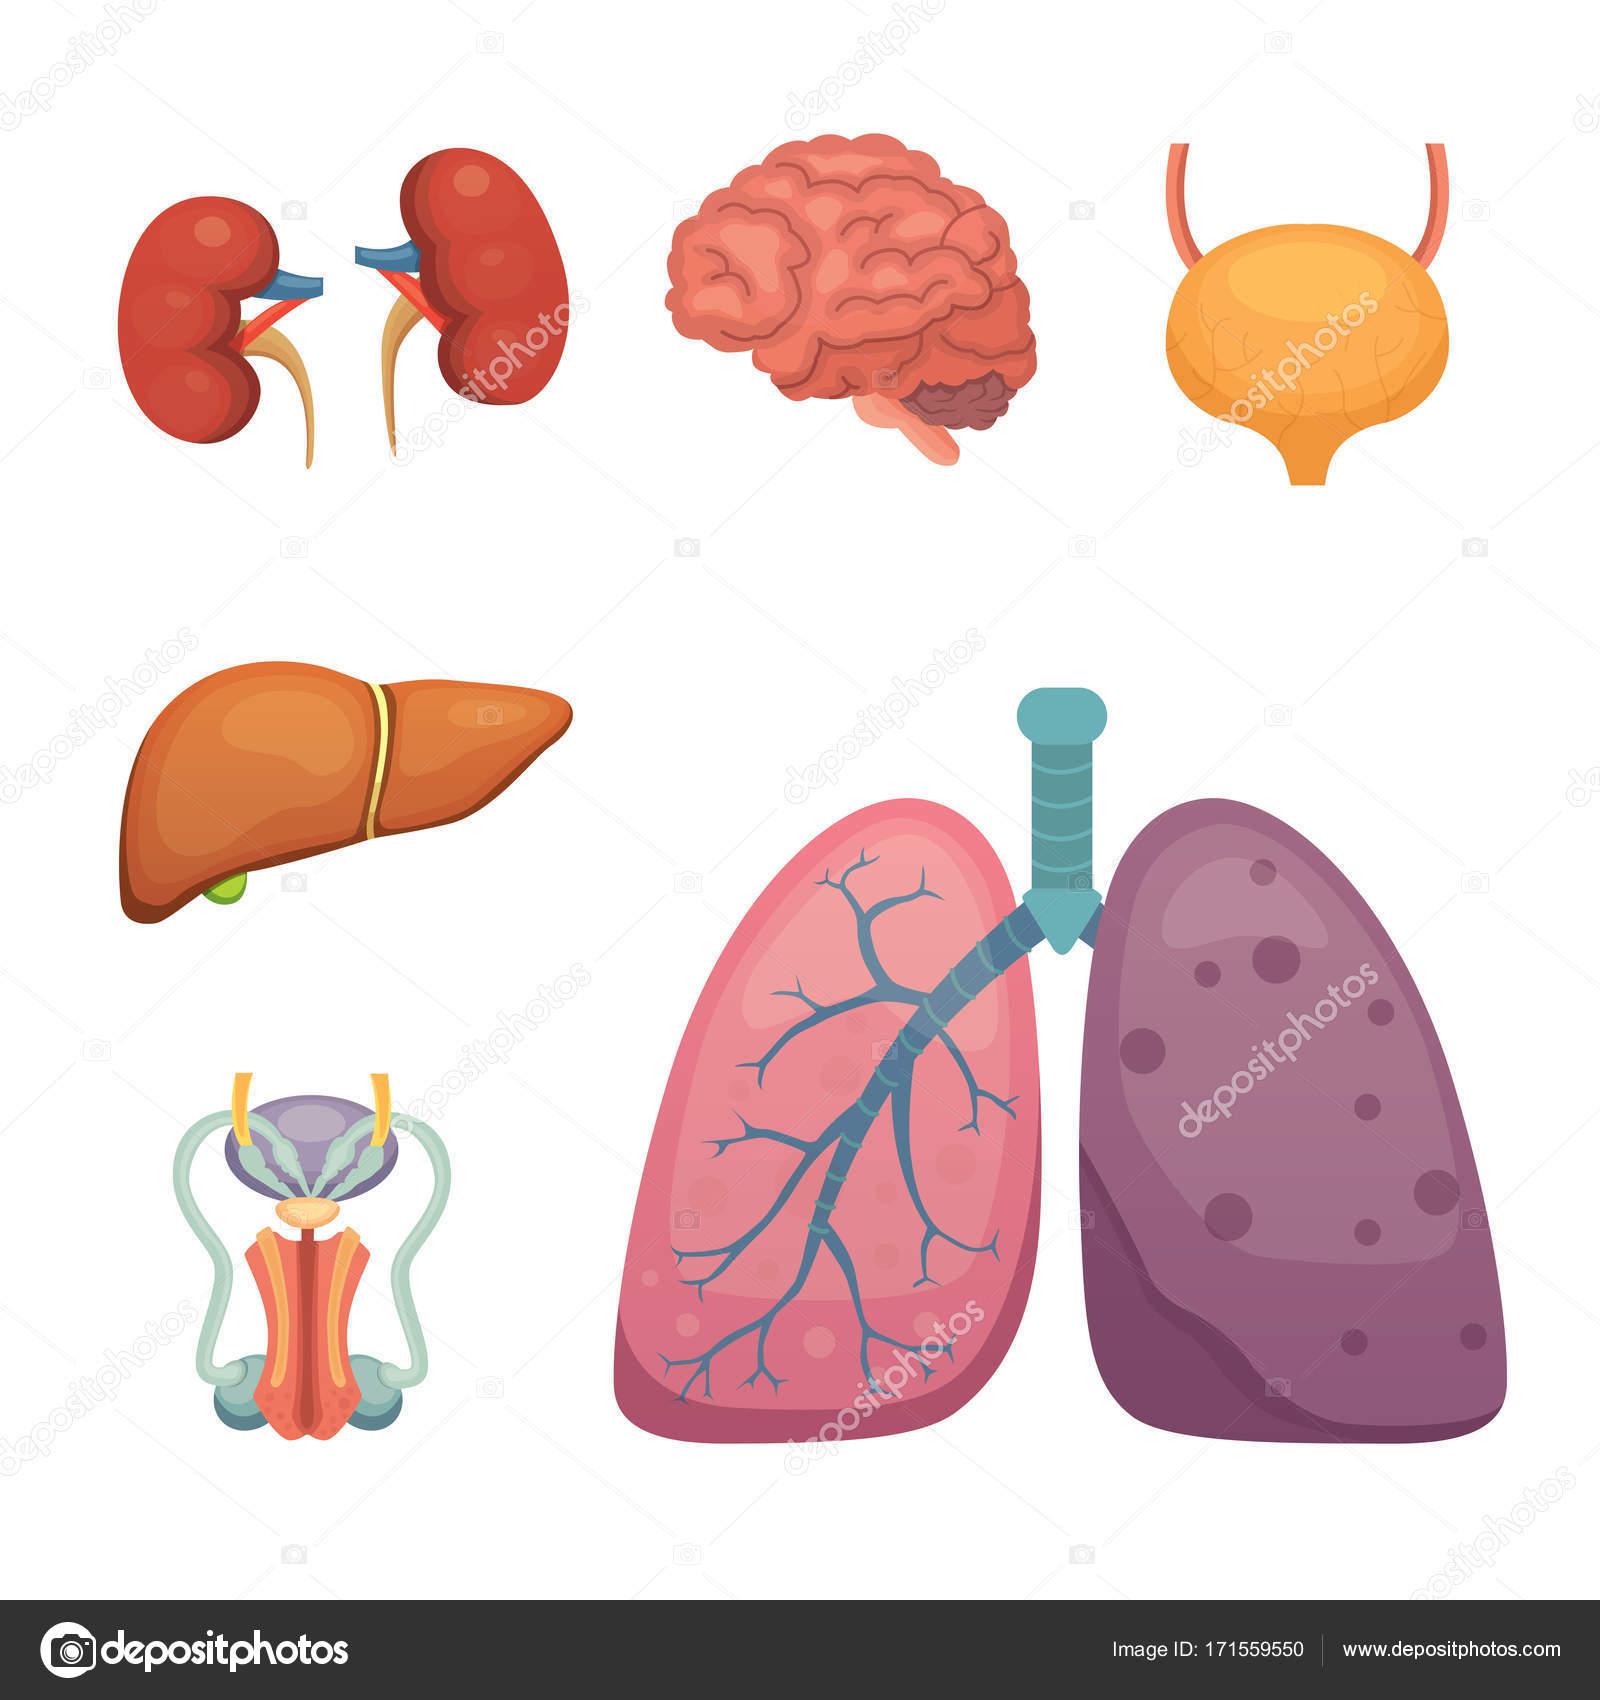 Dessin Corps Humain Organes dessin animé ensemble d'organes humains. anatomie du corps. système